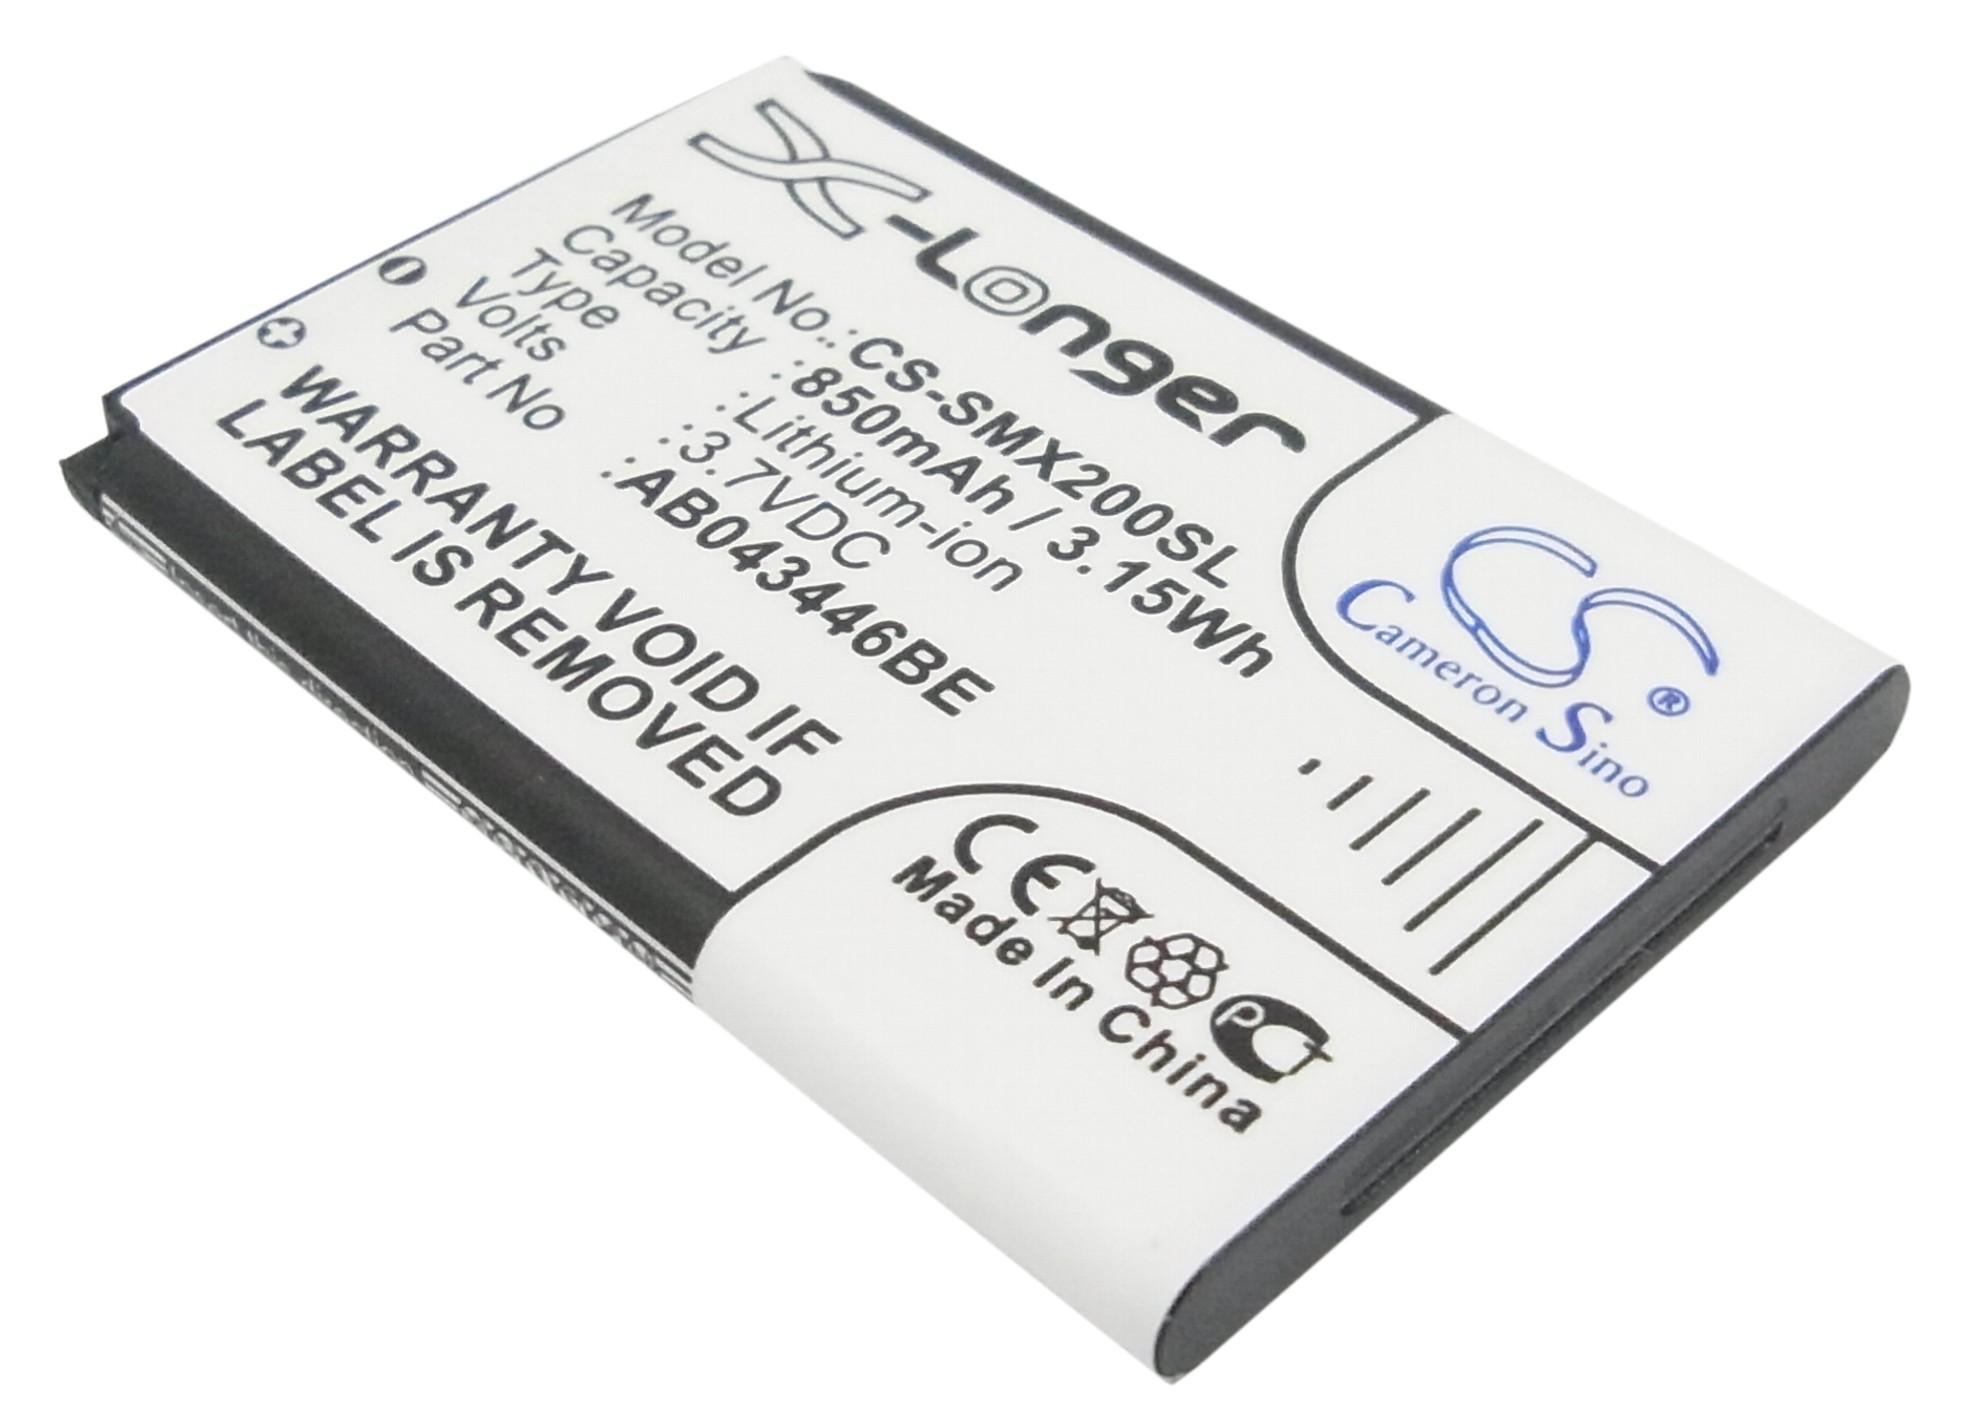 Cameron Sino baterie do mobilů pro SAMSUNG GT-S3030 3.7V Li-ion 850mAh černá - neoriginální